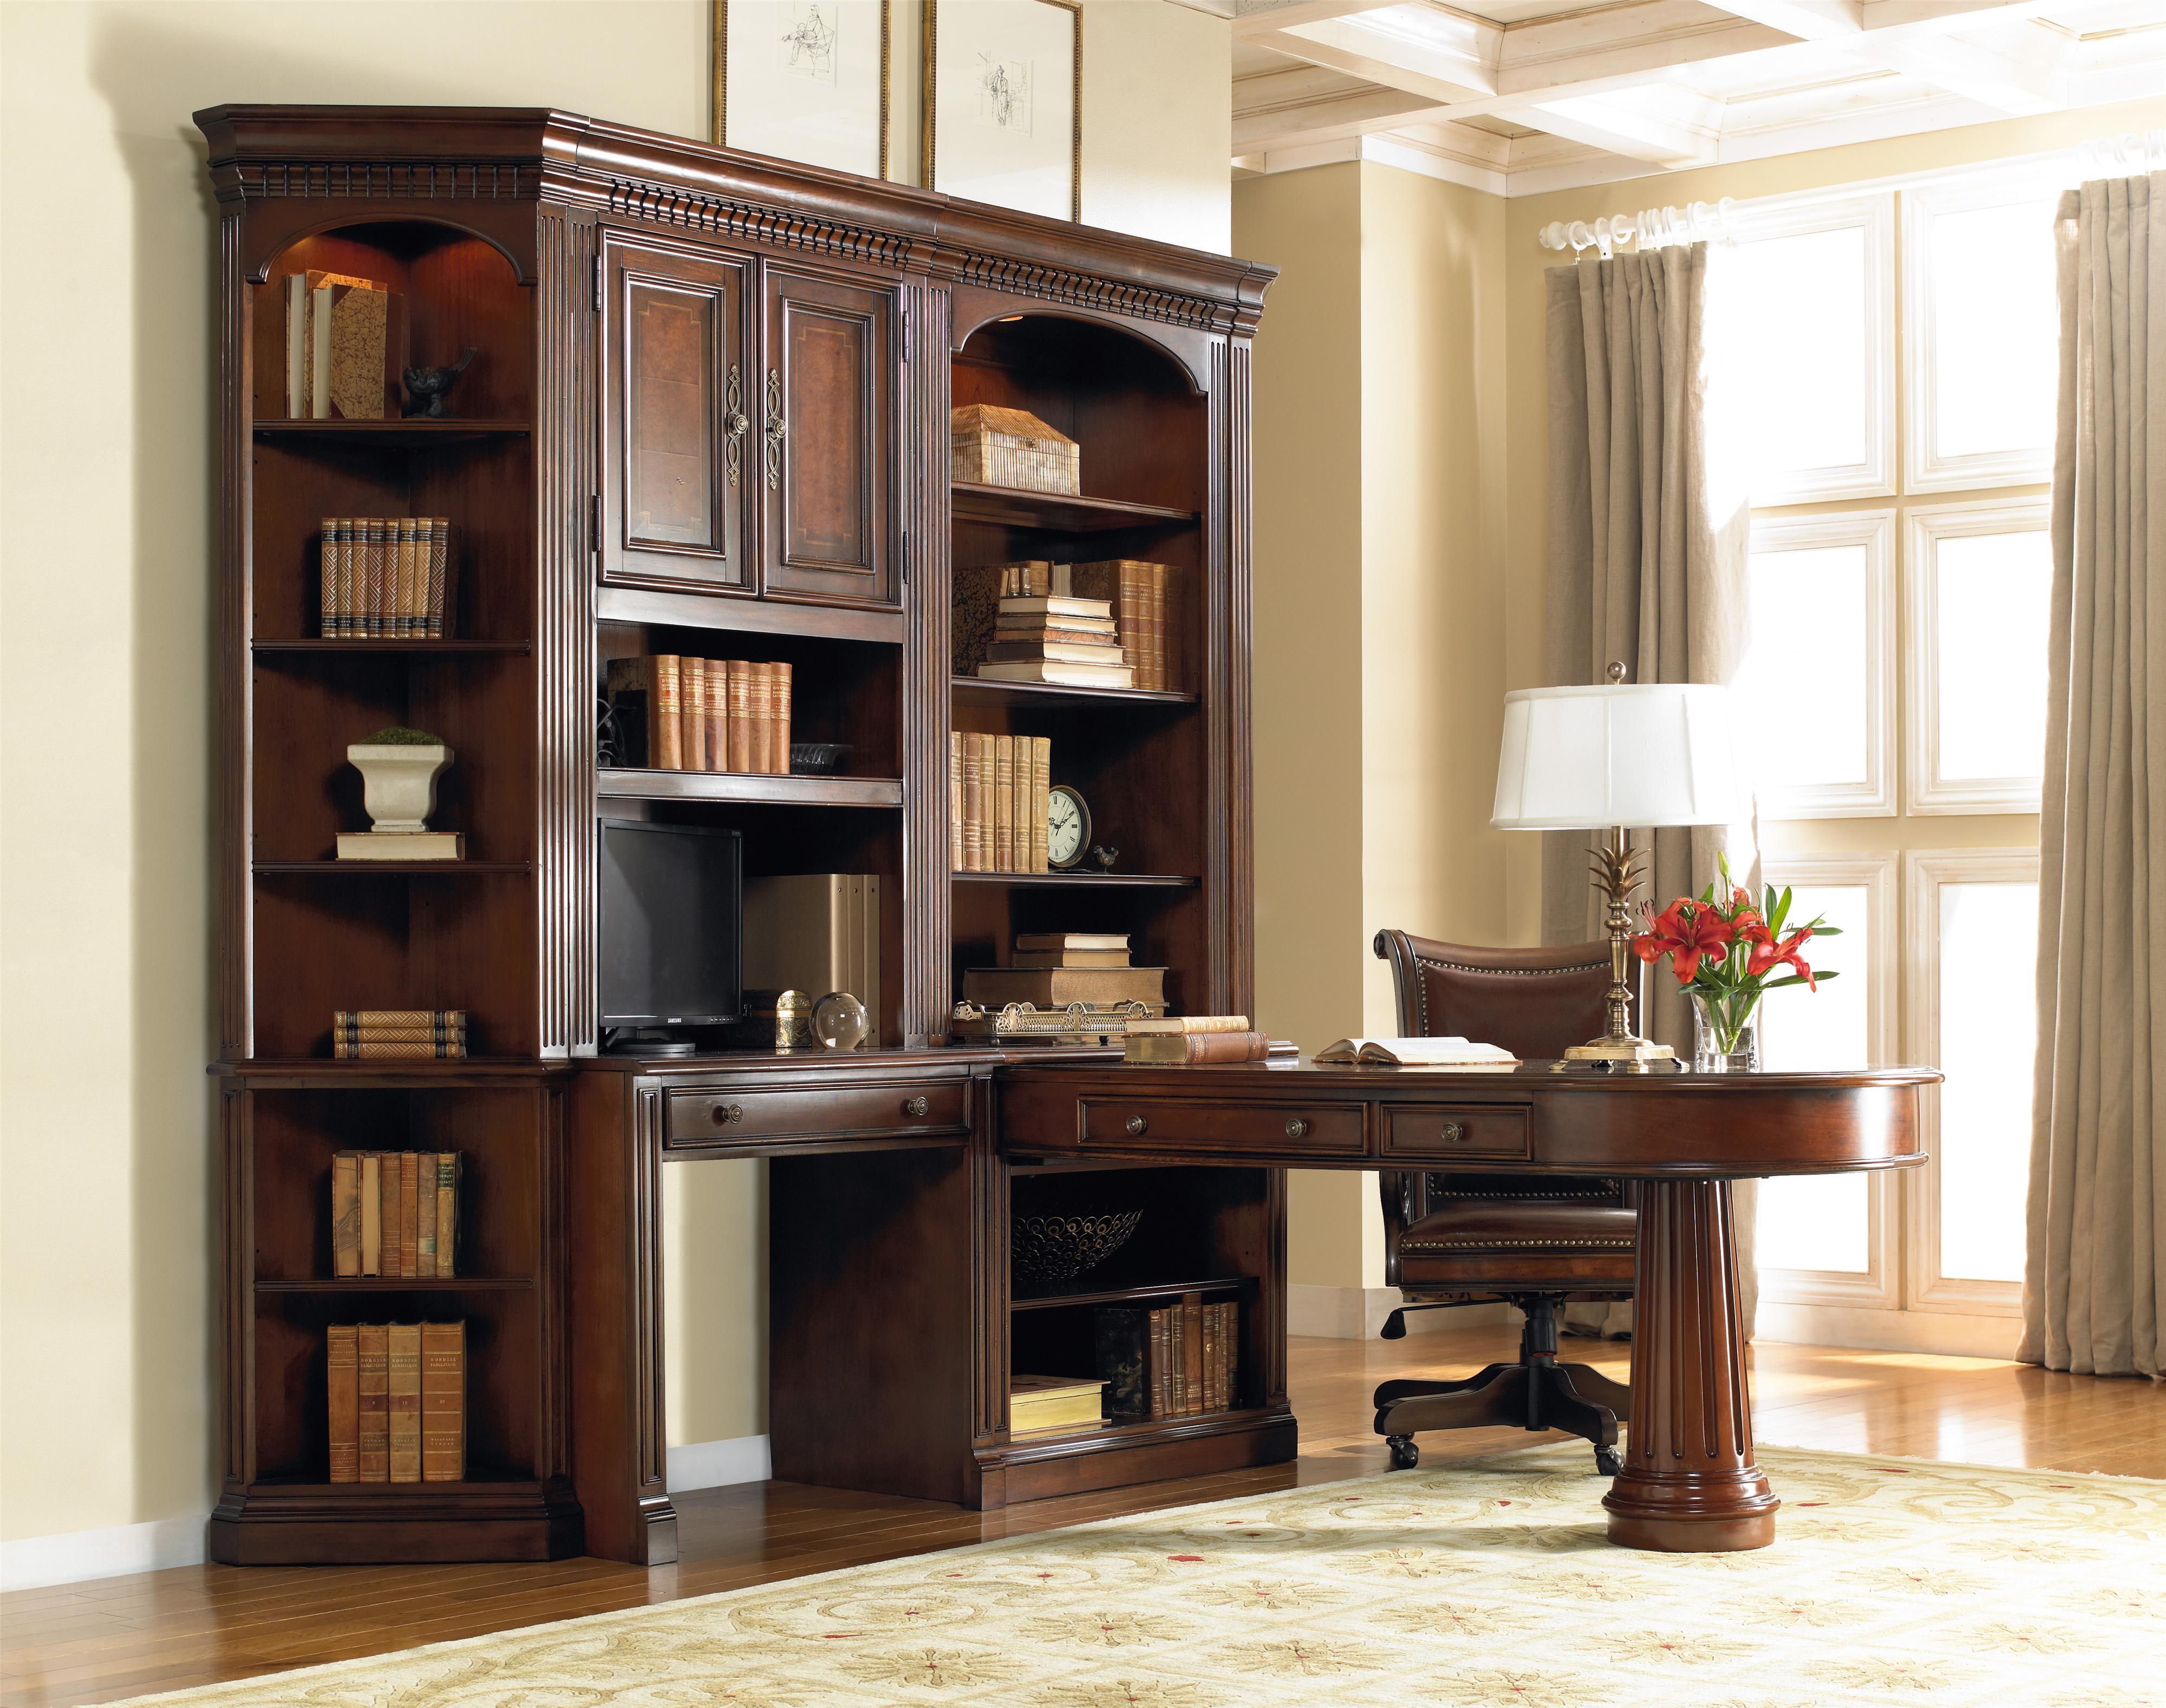 Hooker Furniture European Renaissance II Office Lateral File | DuBois  Furniture | Lateral Files Waco, Temple, Killeen, Texas